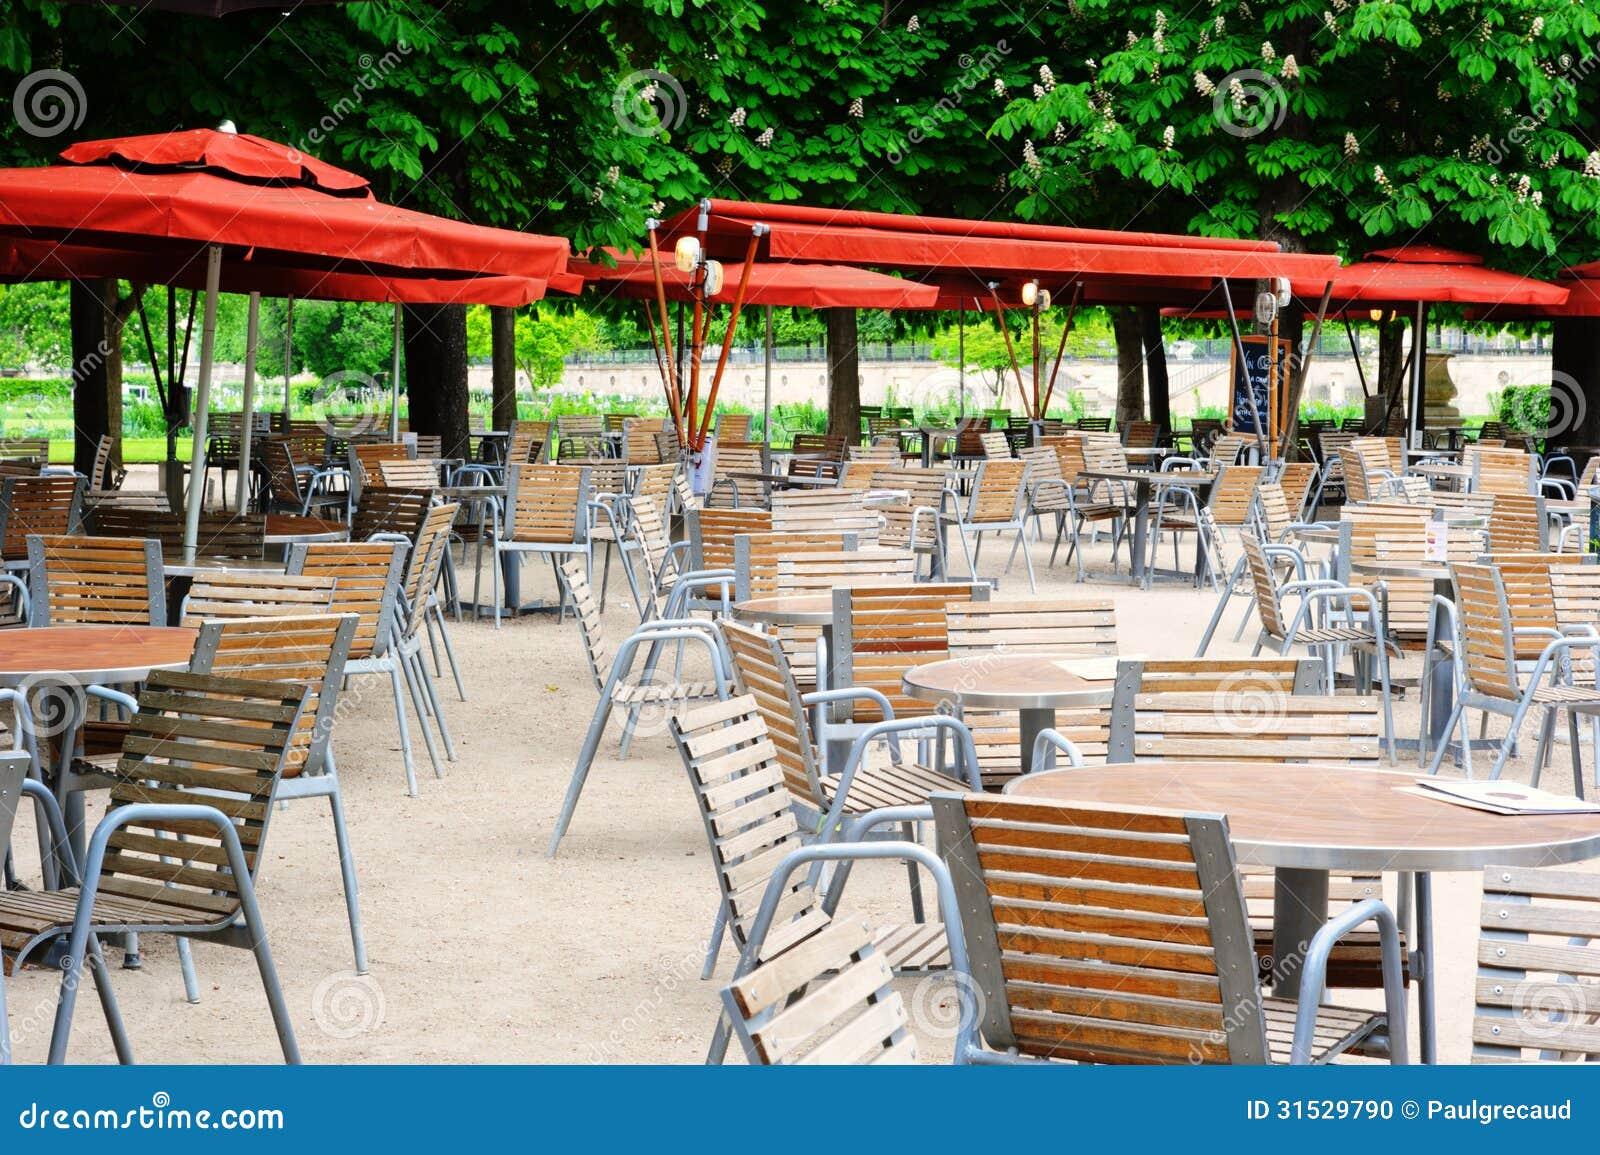 Cafe terrace in tuileries garden paris stock photo for Restaurant paris jardin